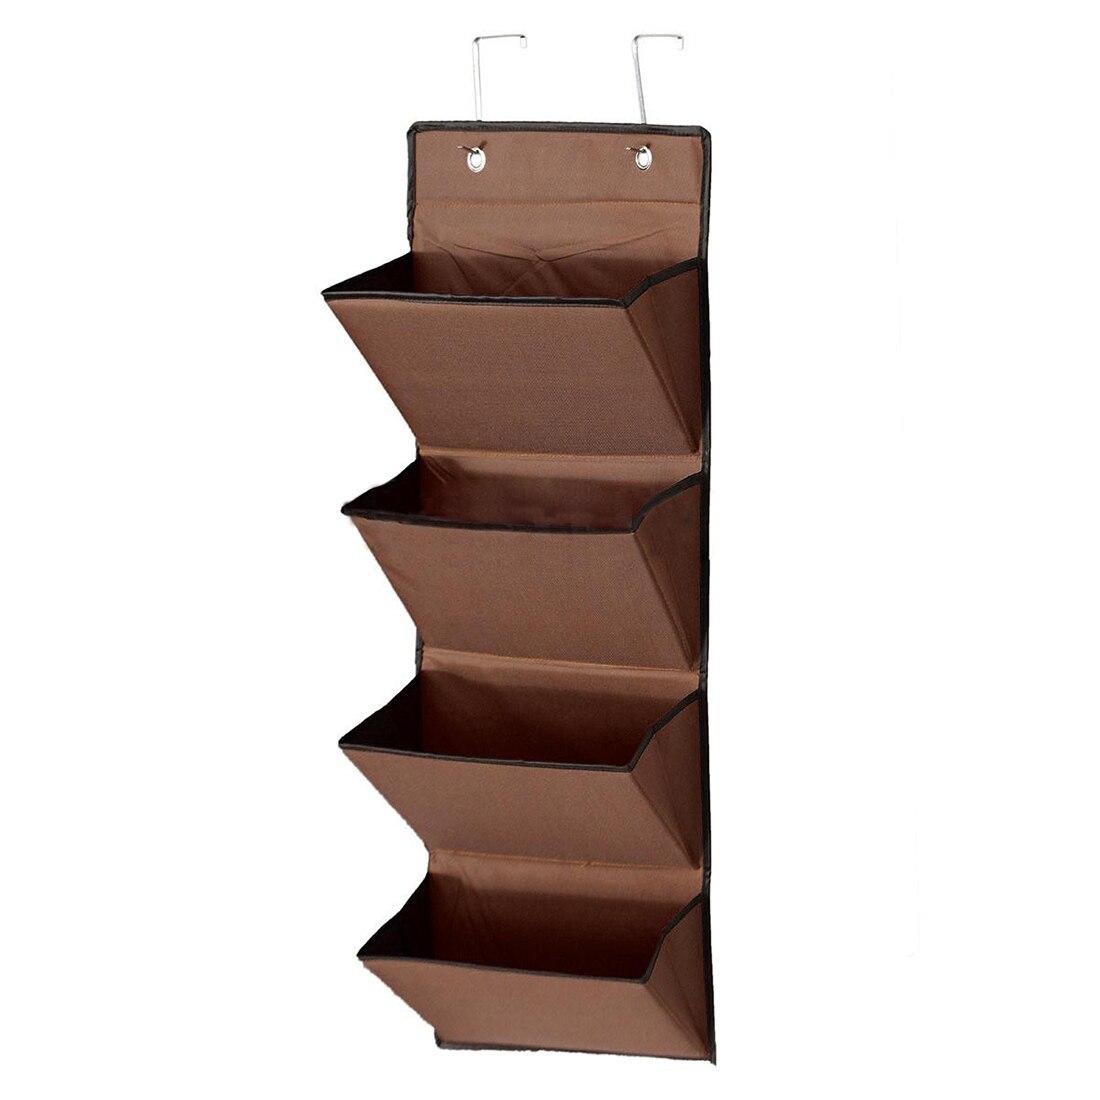 3 colores 4 nivel puerta de pared colgante organizador almacenamiento rack bag bolsa de tela de calzado